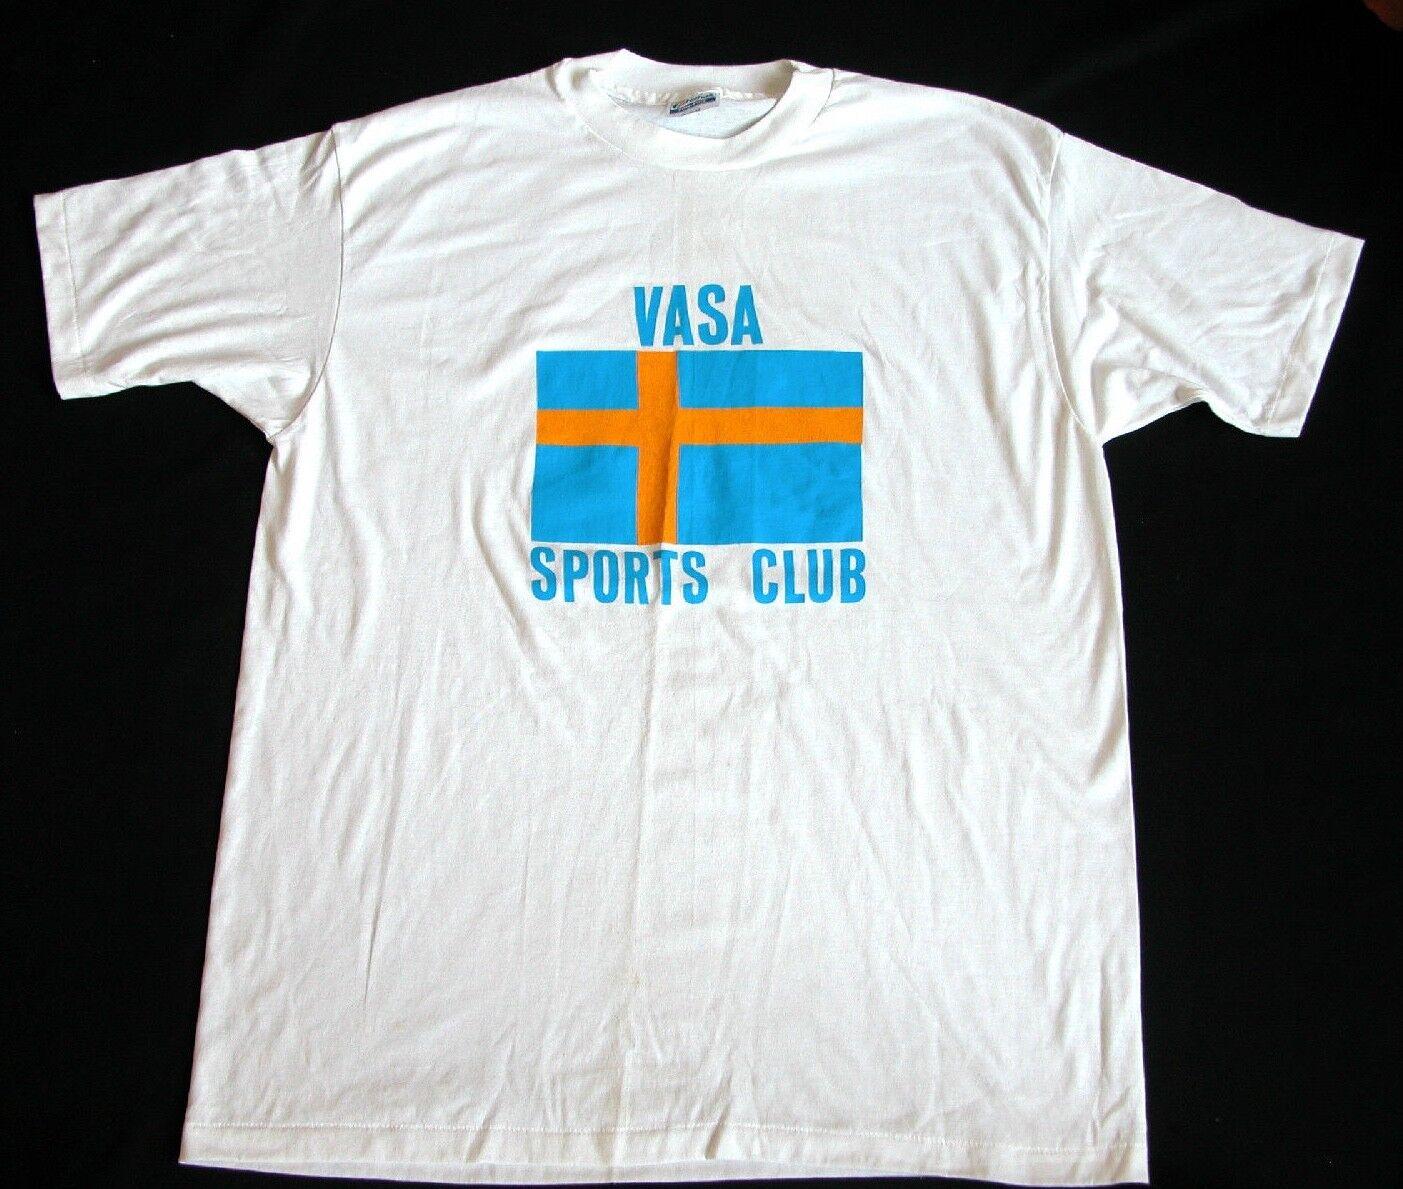 Vtg 80s Sweden VASA Sports Club T Shirt Sweden Flag T Shirt XL 46-48 Football